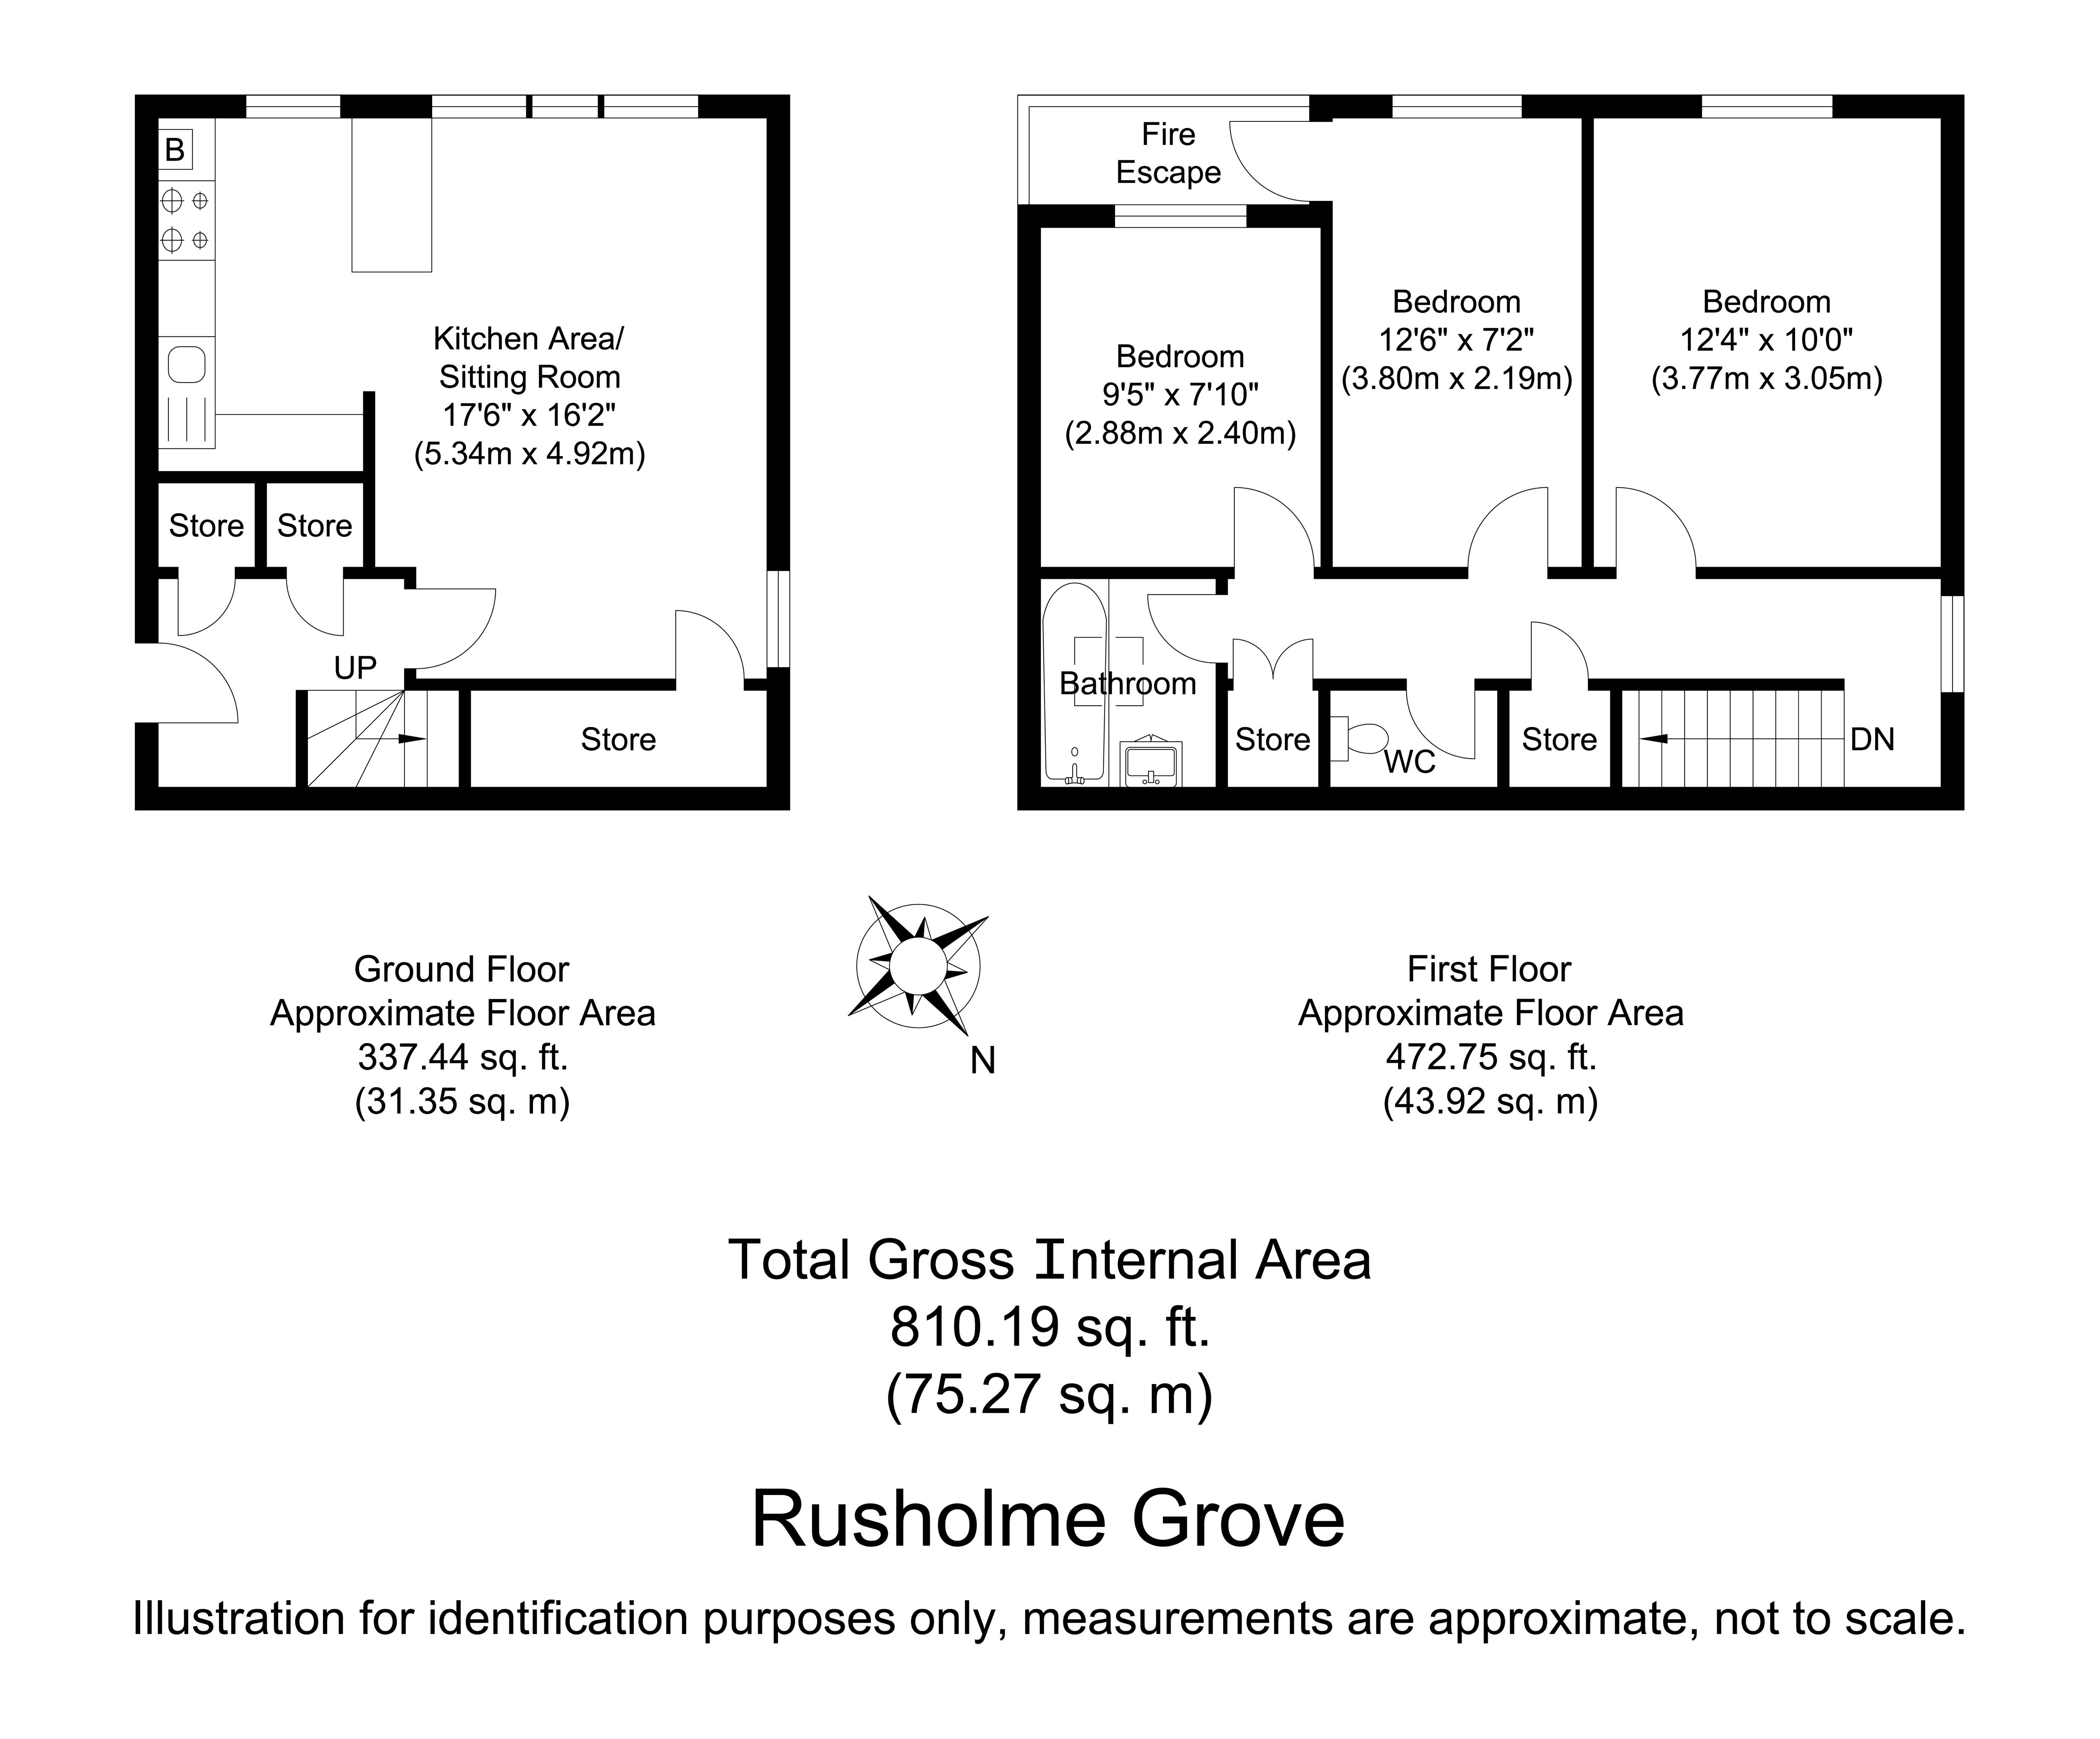 Rusholme Grove Crystal Palace Se19 3 Bedroom Maisonette